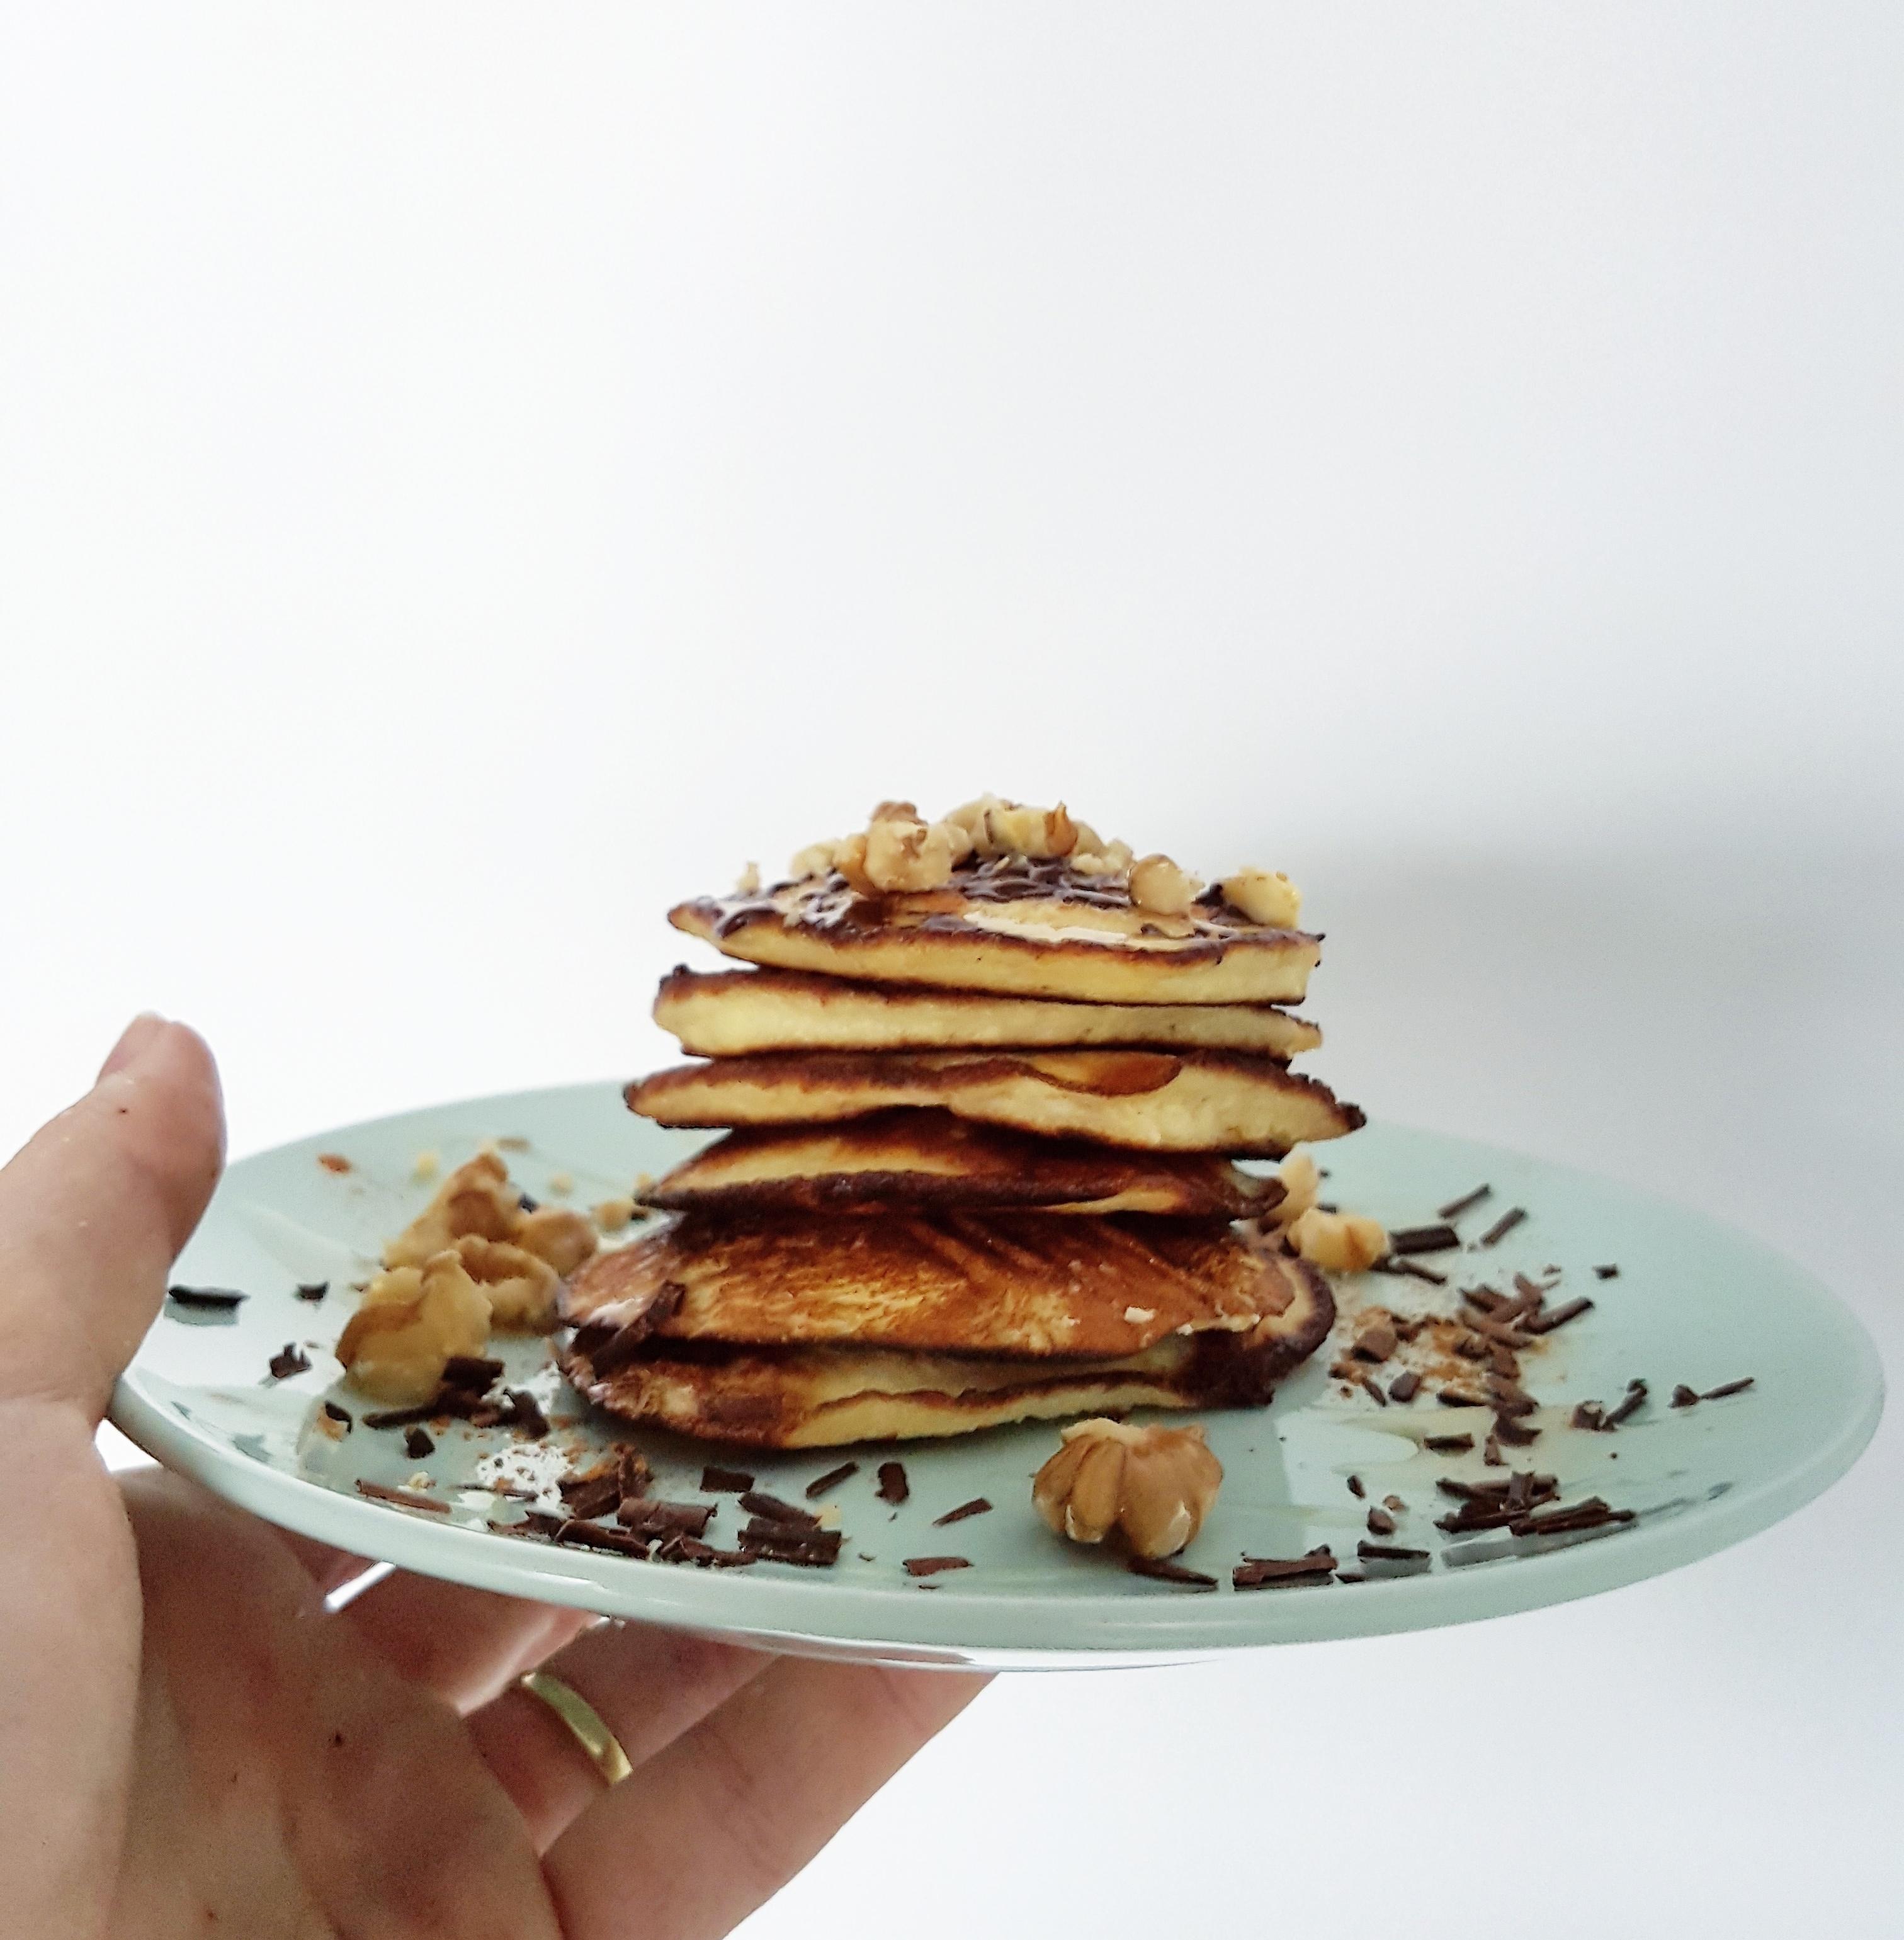 Ontbijtrecepten, kokos pancakes